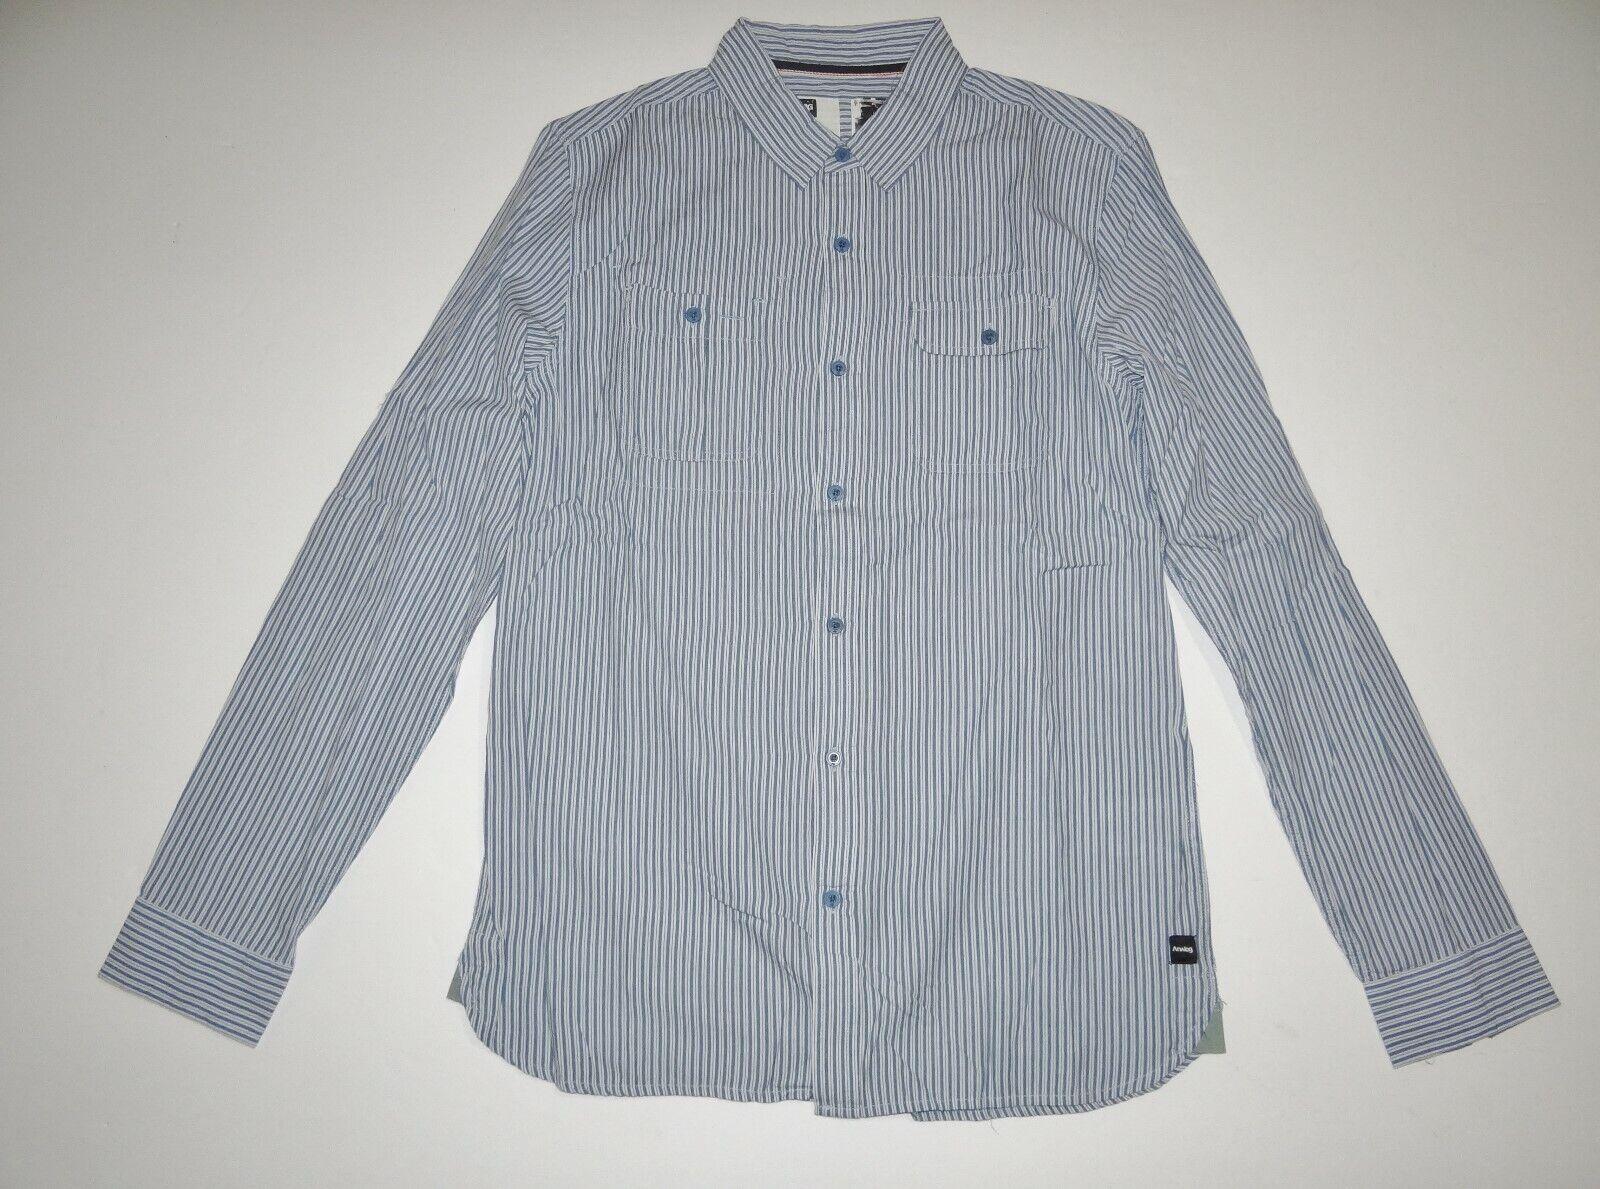 9abedca65e9 New Mens Long Casual Button Up Classic Fit Cotton Shirt Medium ...